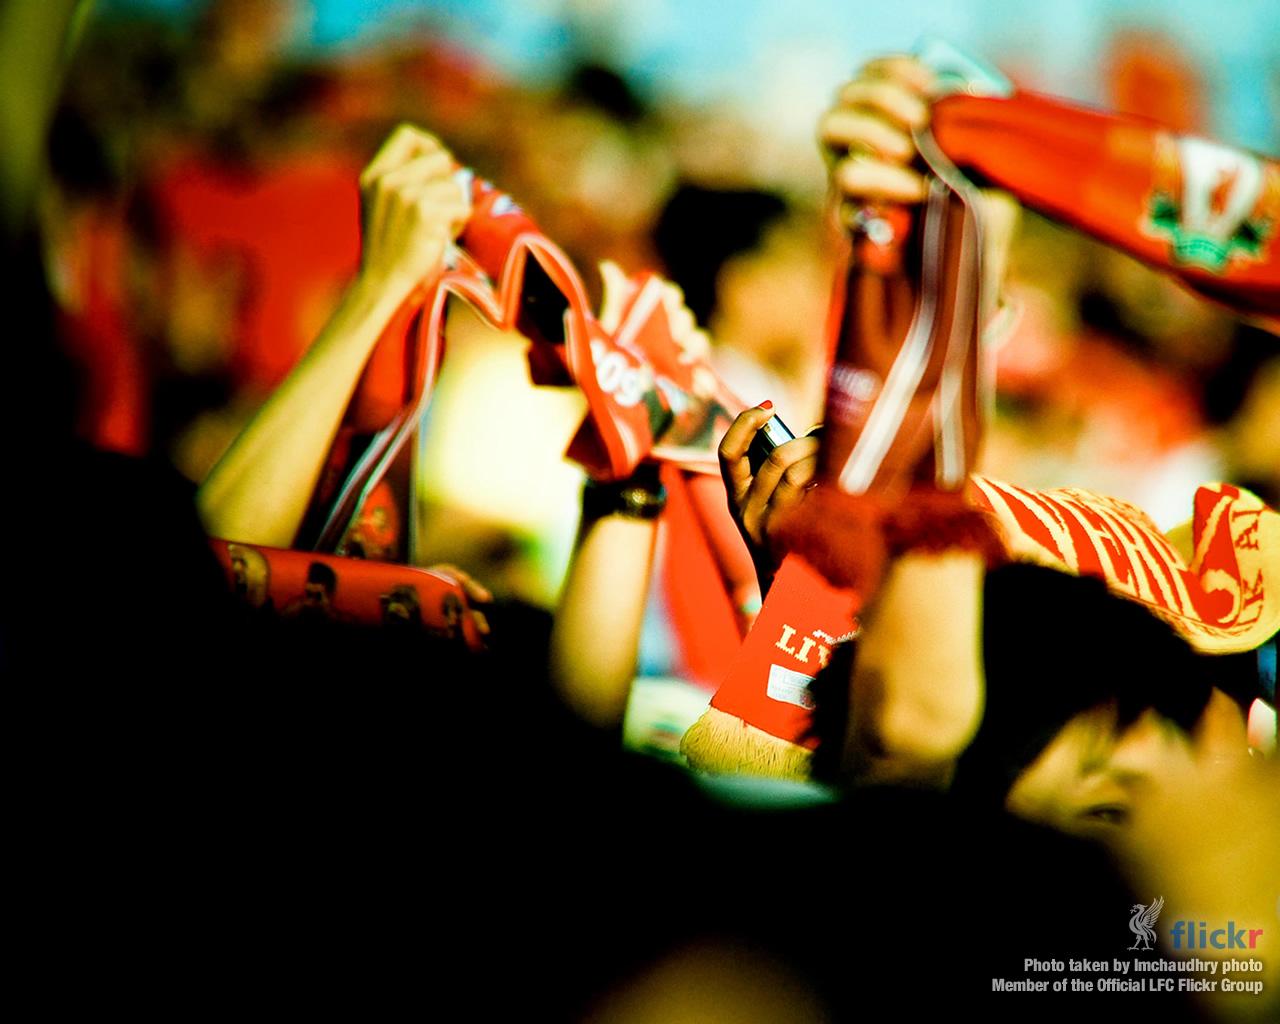 Gambar-gambar Kegayaan Liverpool FC